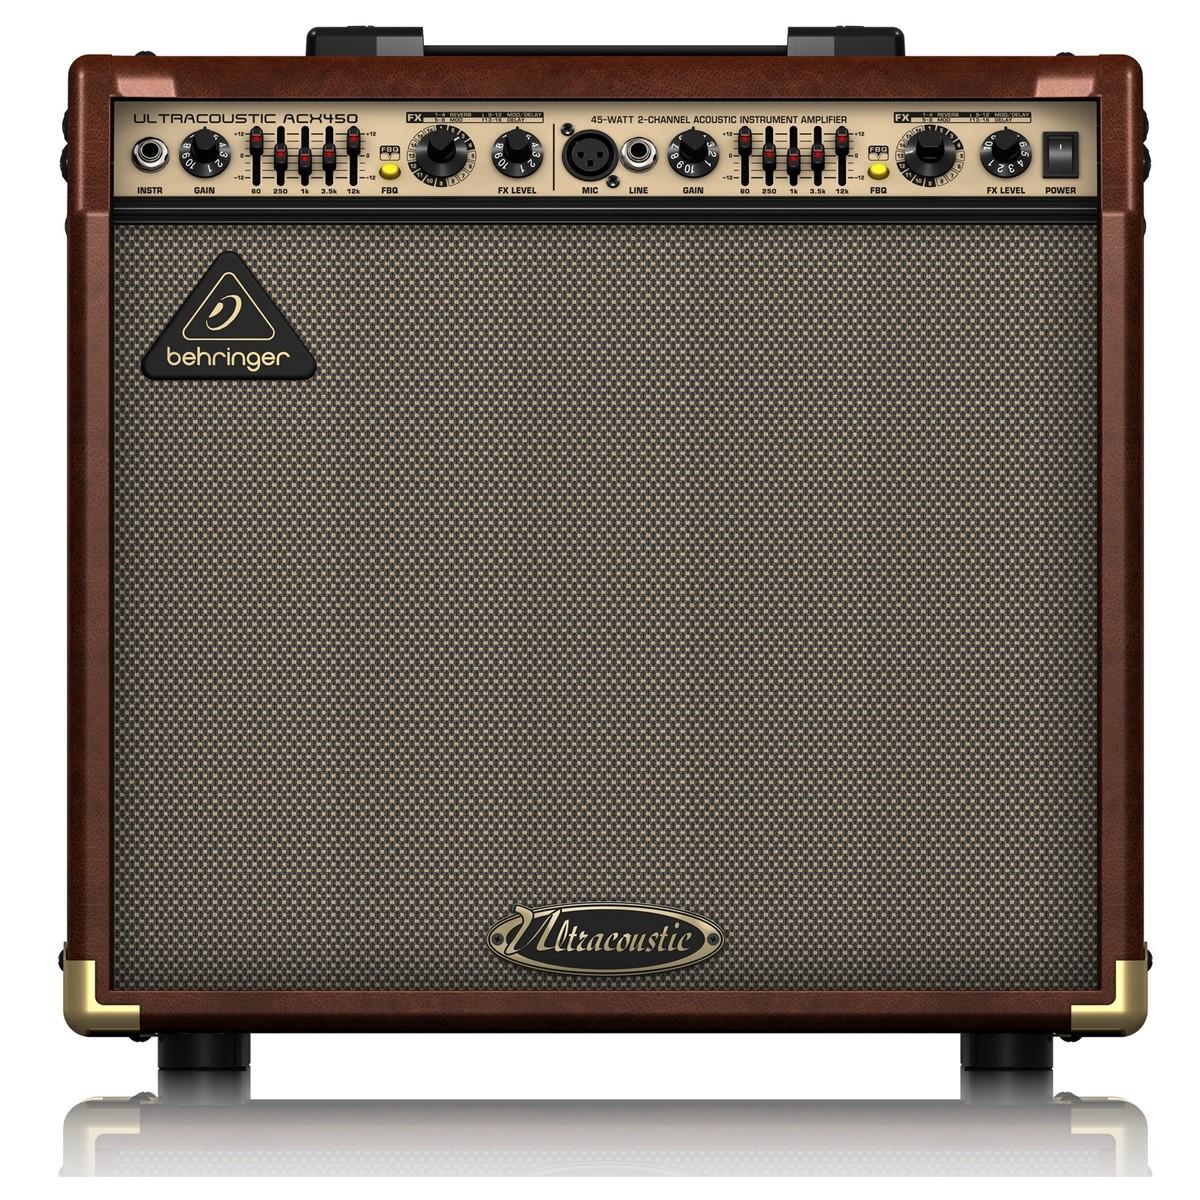 behringer acx450 ultracoustic amp at gear4music. Black Bedroom Furniture Sets. Home Design Ideas